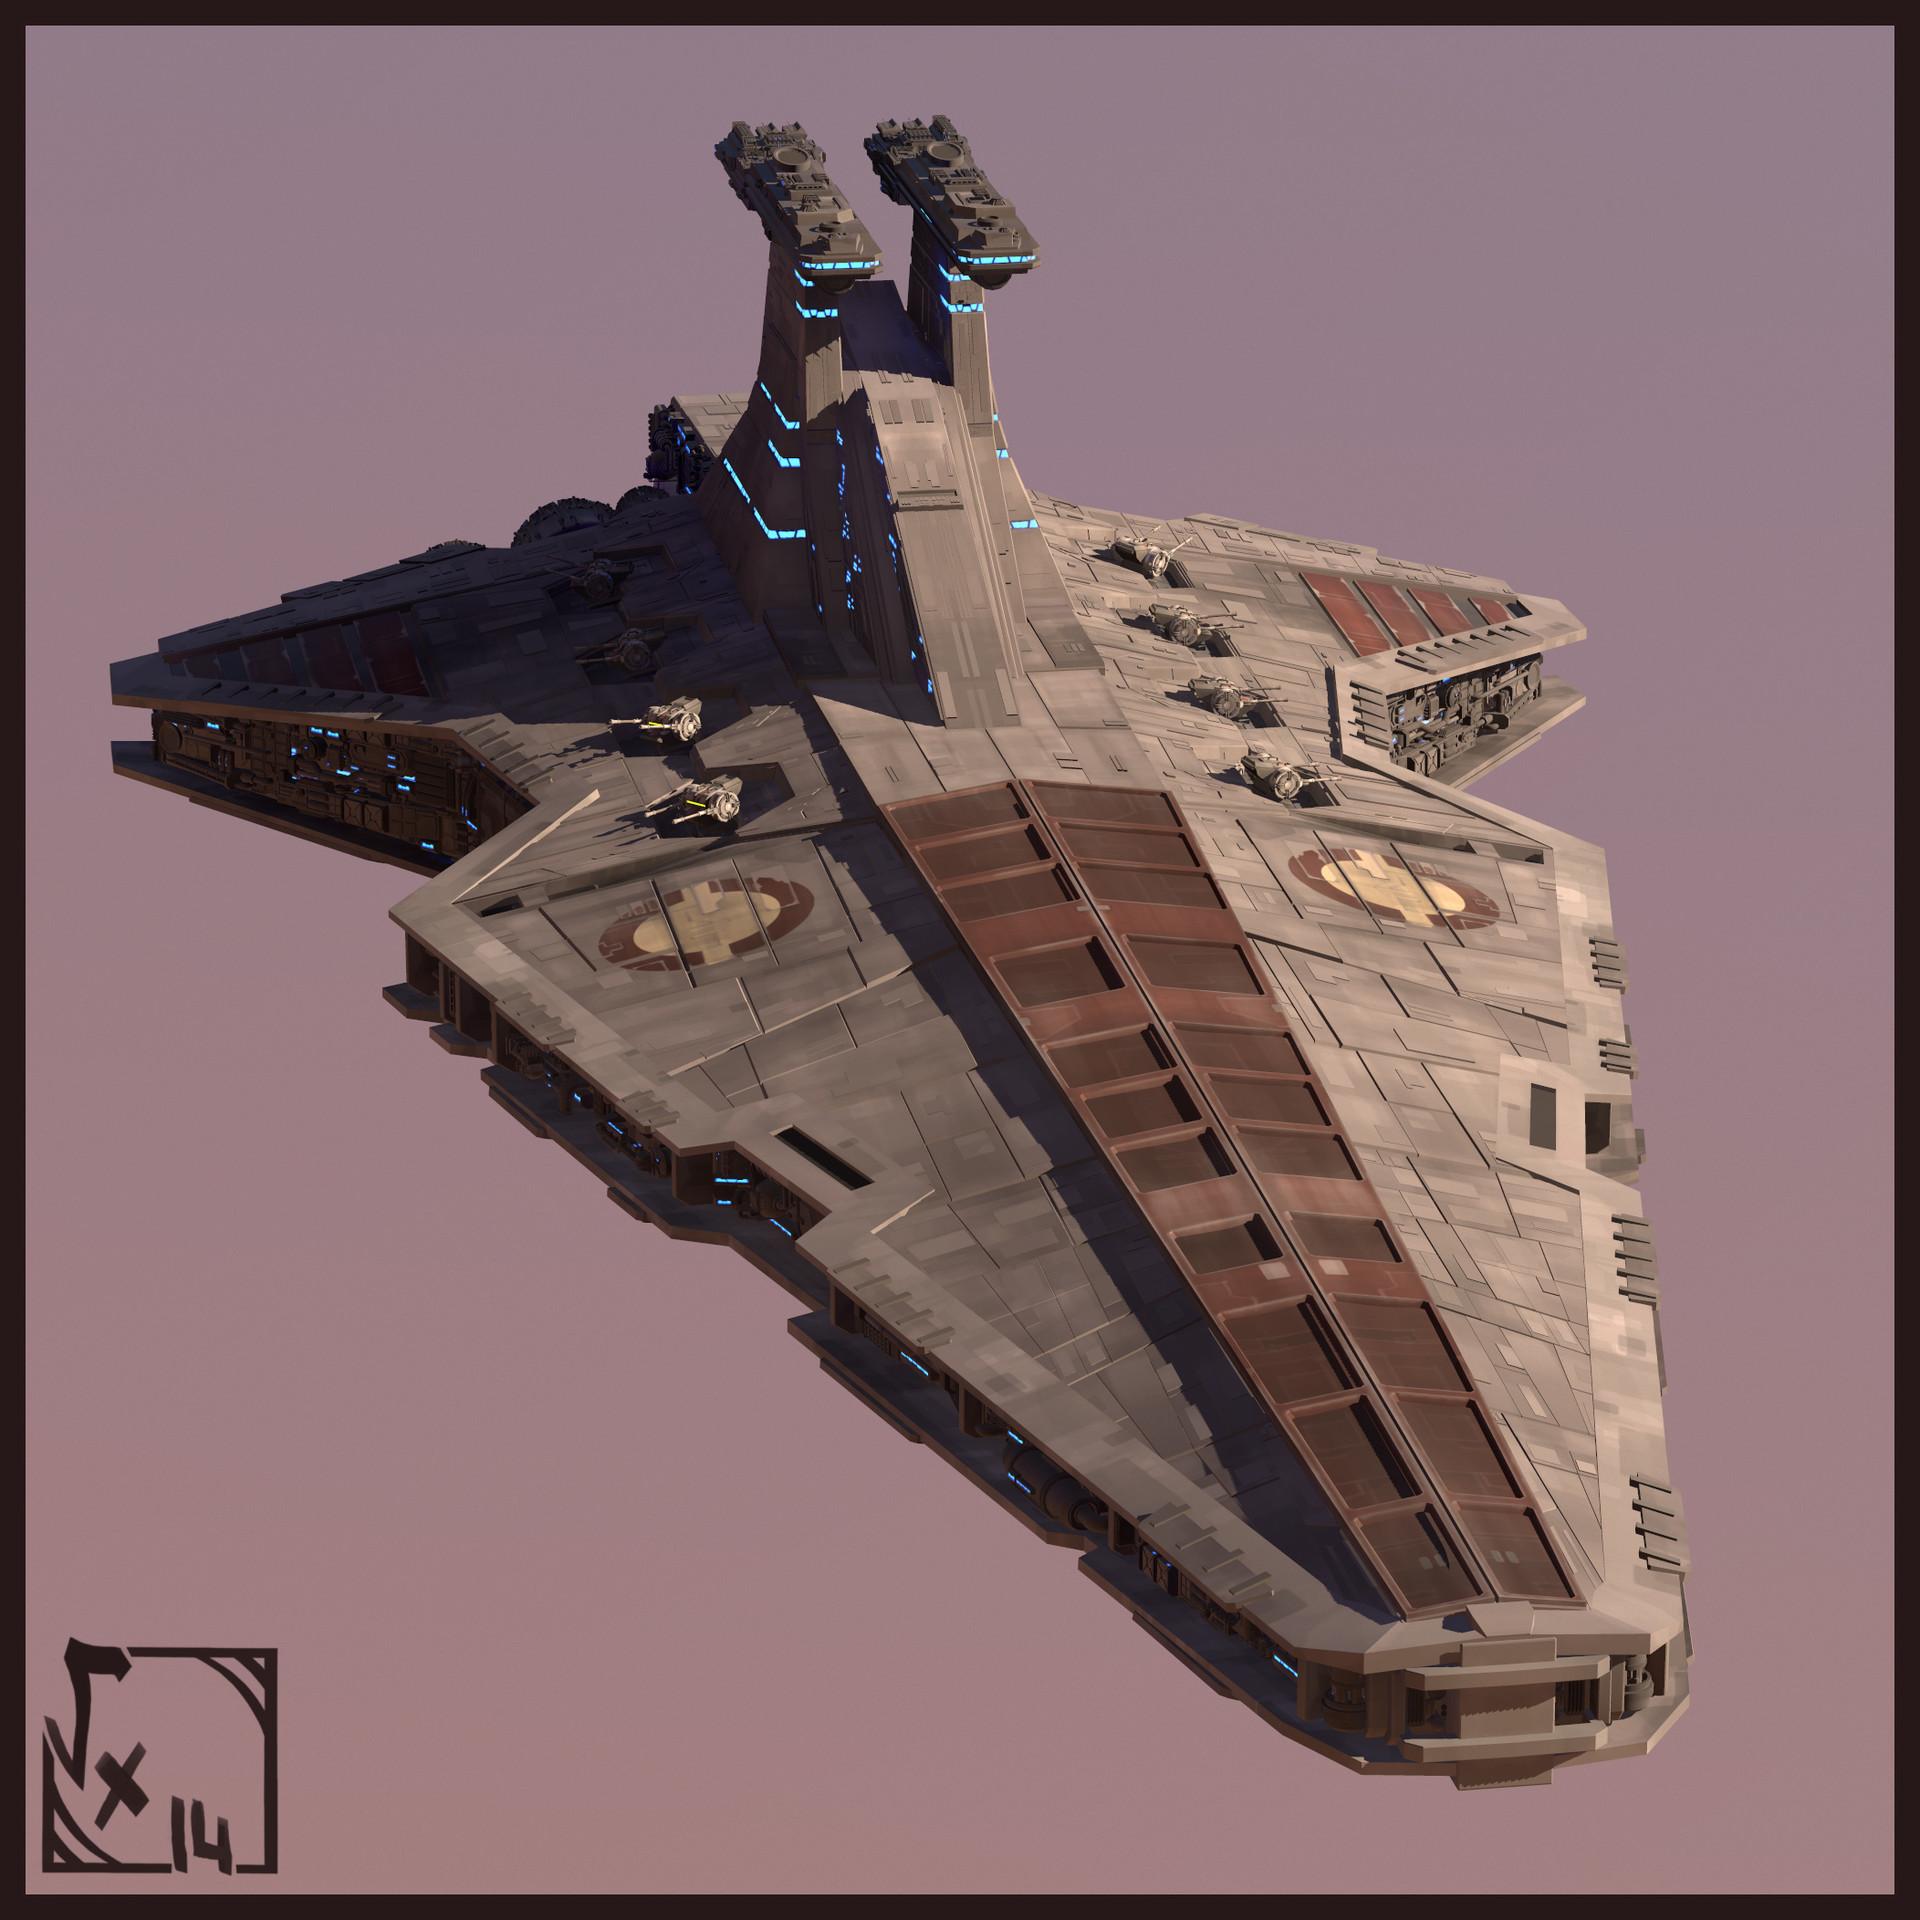 etienne-beschet-thumbnail-prp-destroyer-